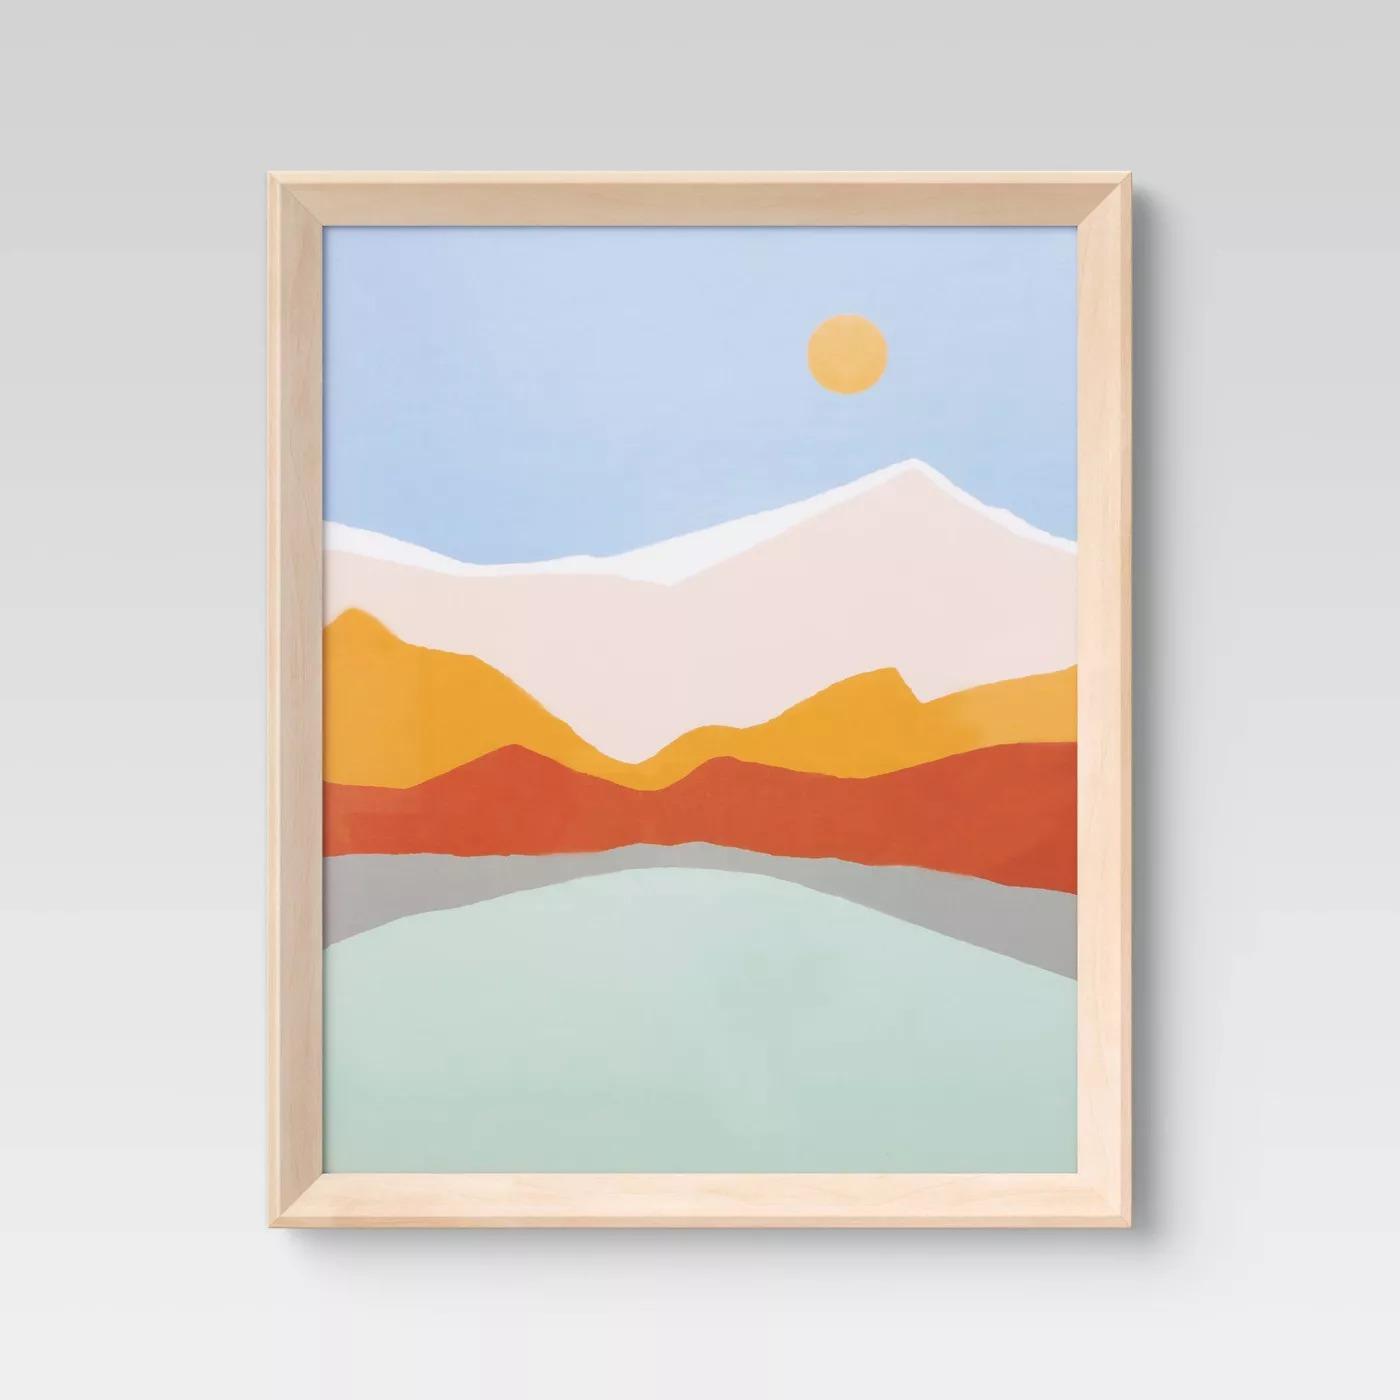 Wedge Poster Frame Natural